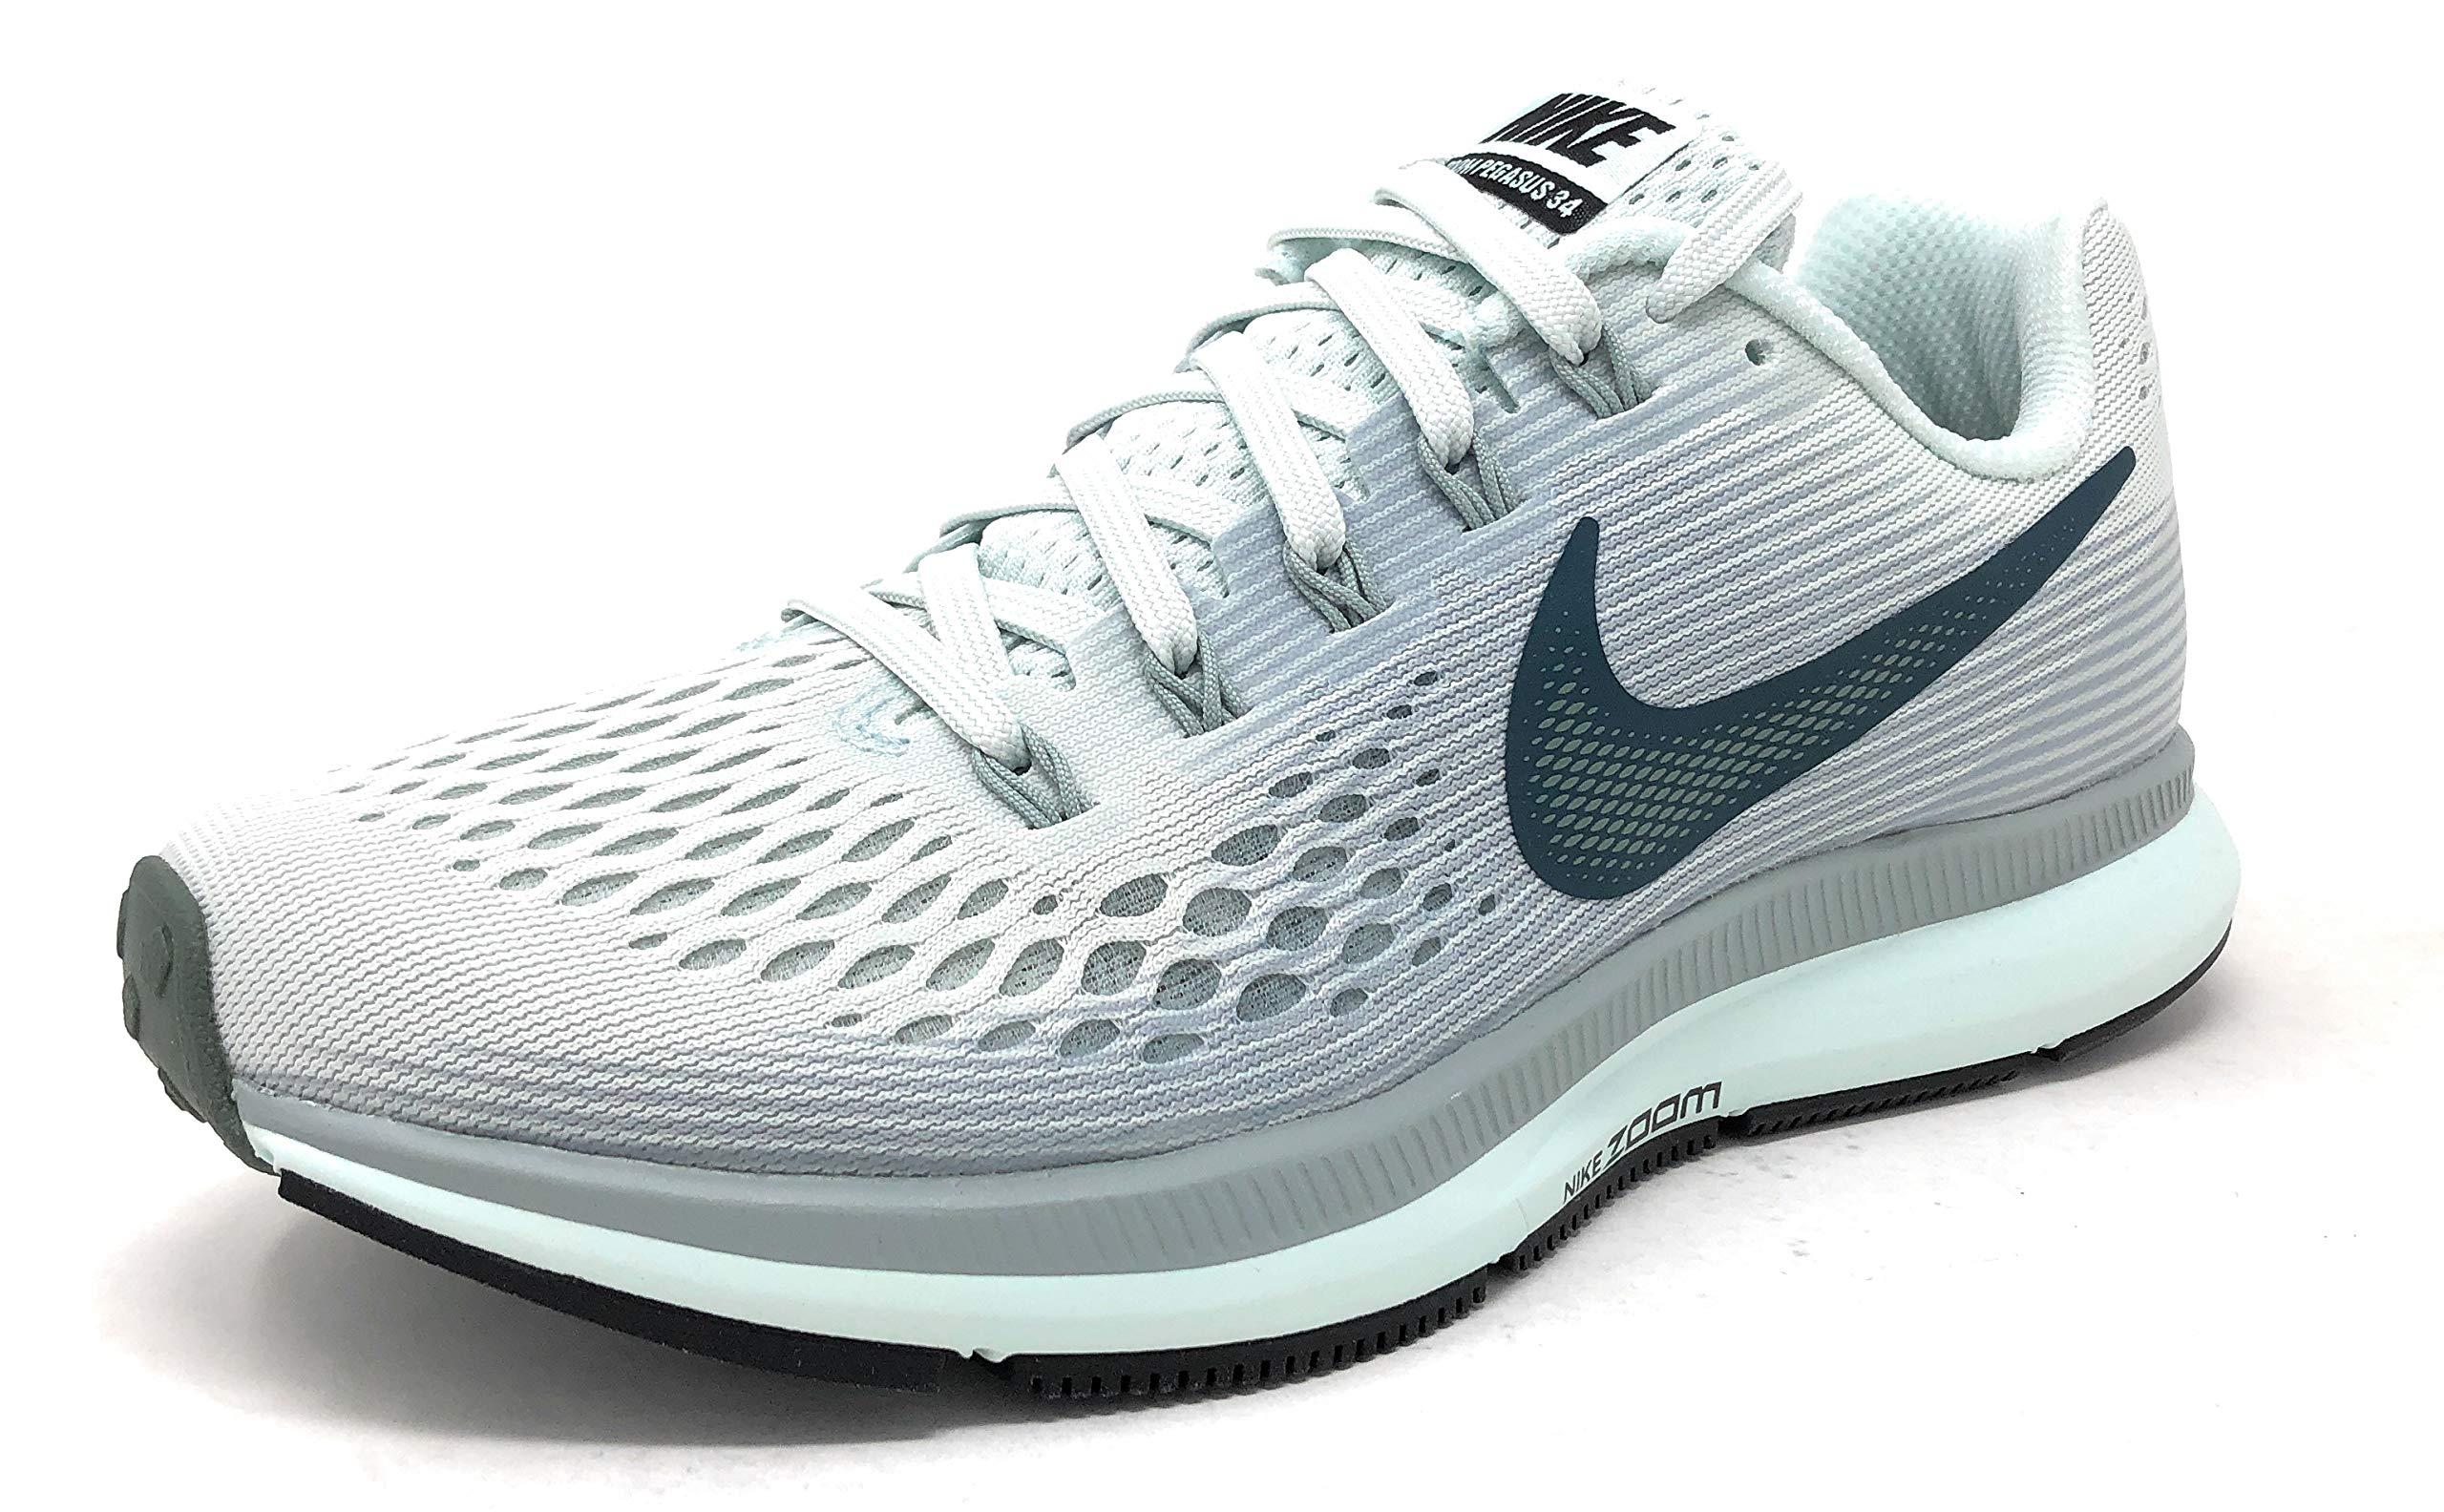 Nike Womens Air Zoom Pegasus 34 Low Top Lace Up Running Sneaker (Barely Grey/Deep Jungle, 5 M US)